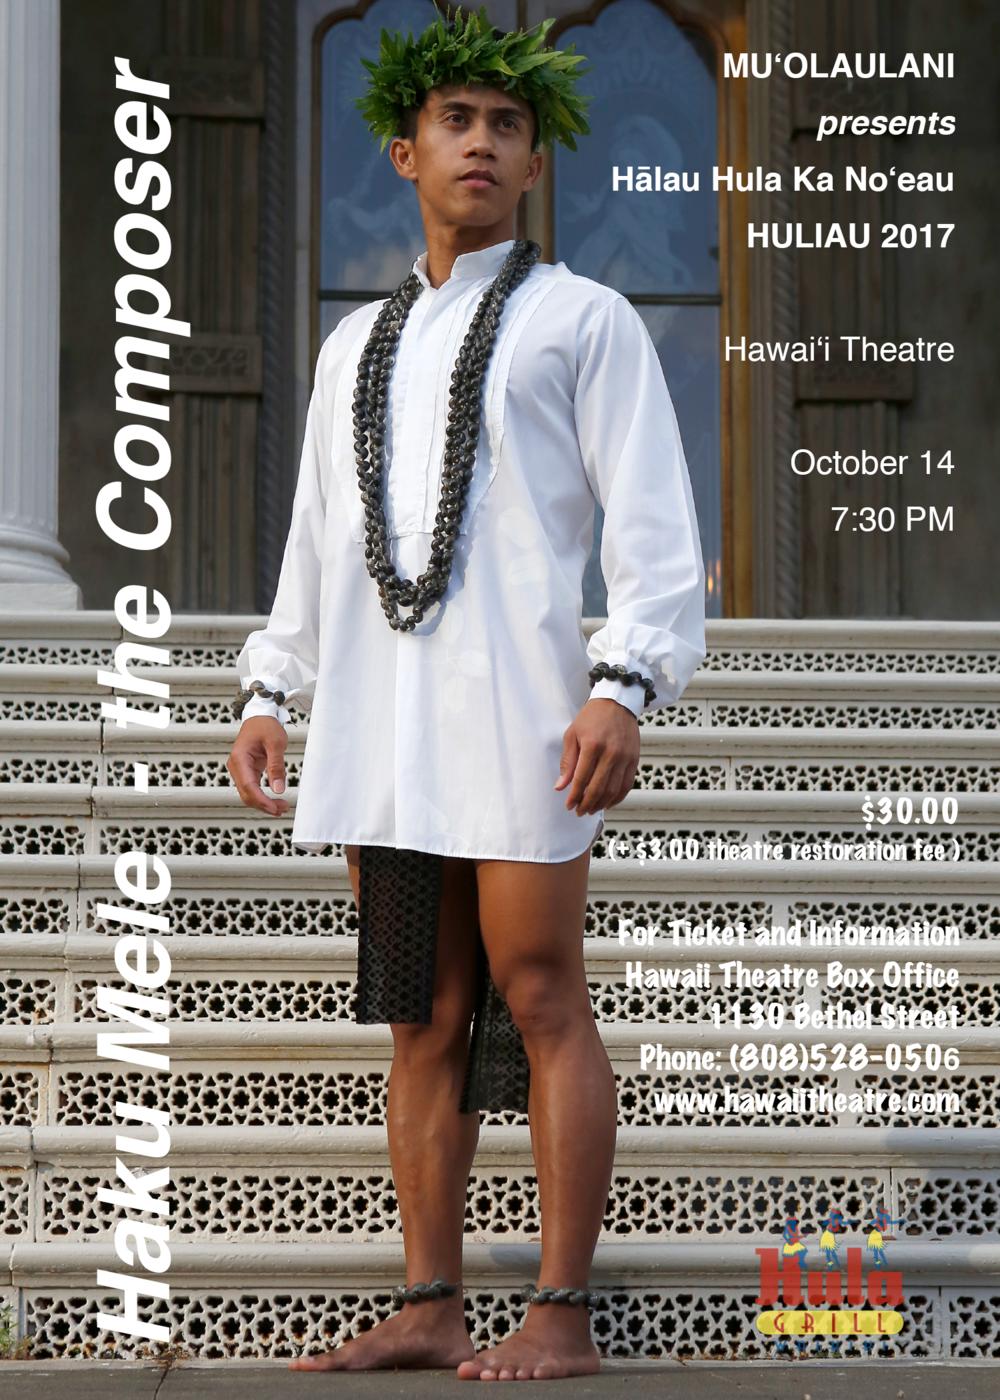 Huliau-2017-Postcard-6X4.png